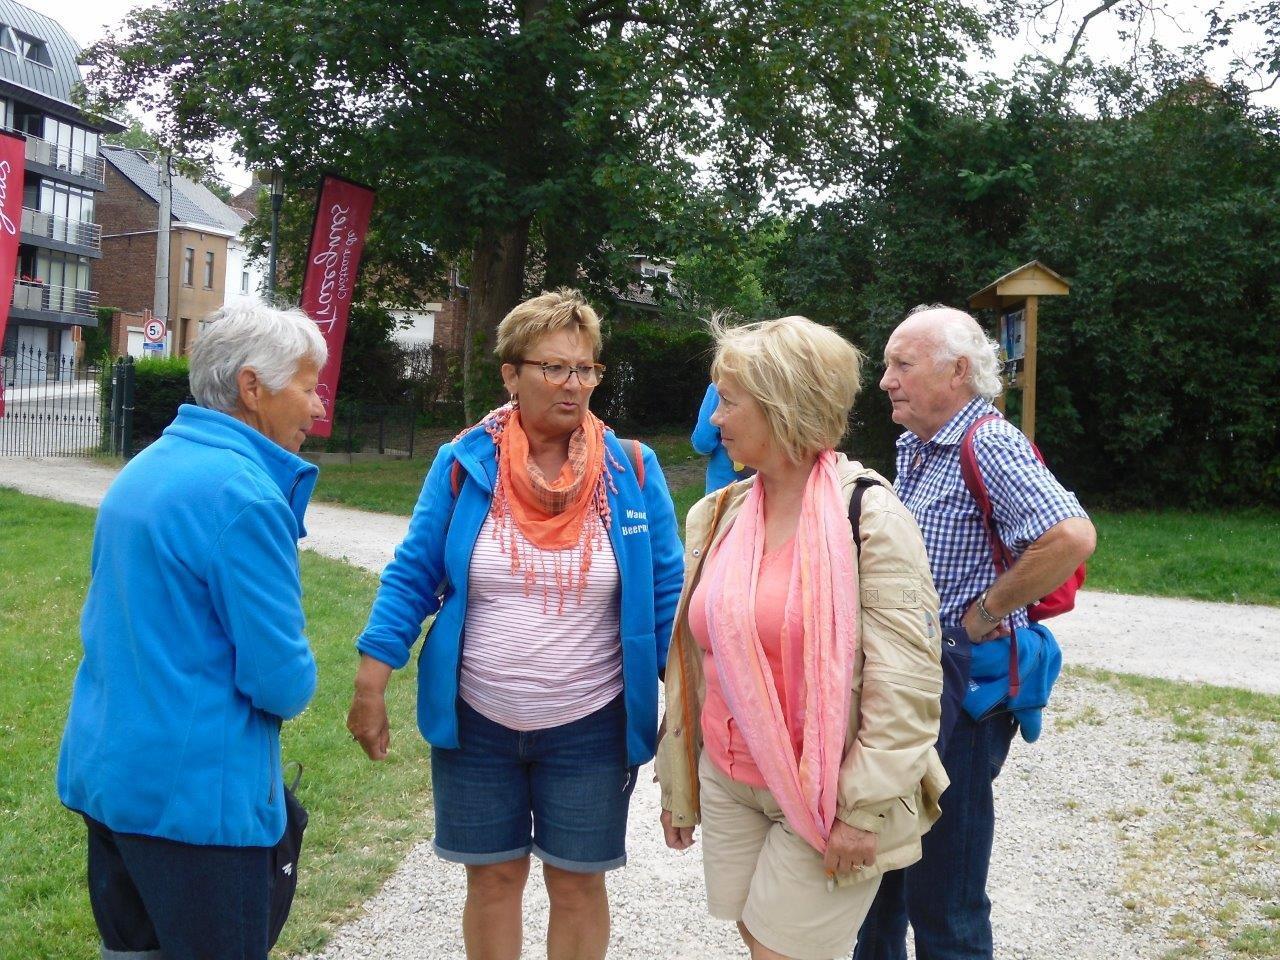 Wandelentocht-Forchies-La-Marche-op-7-07-2019.-6